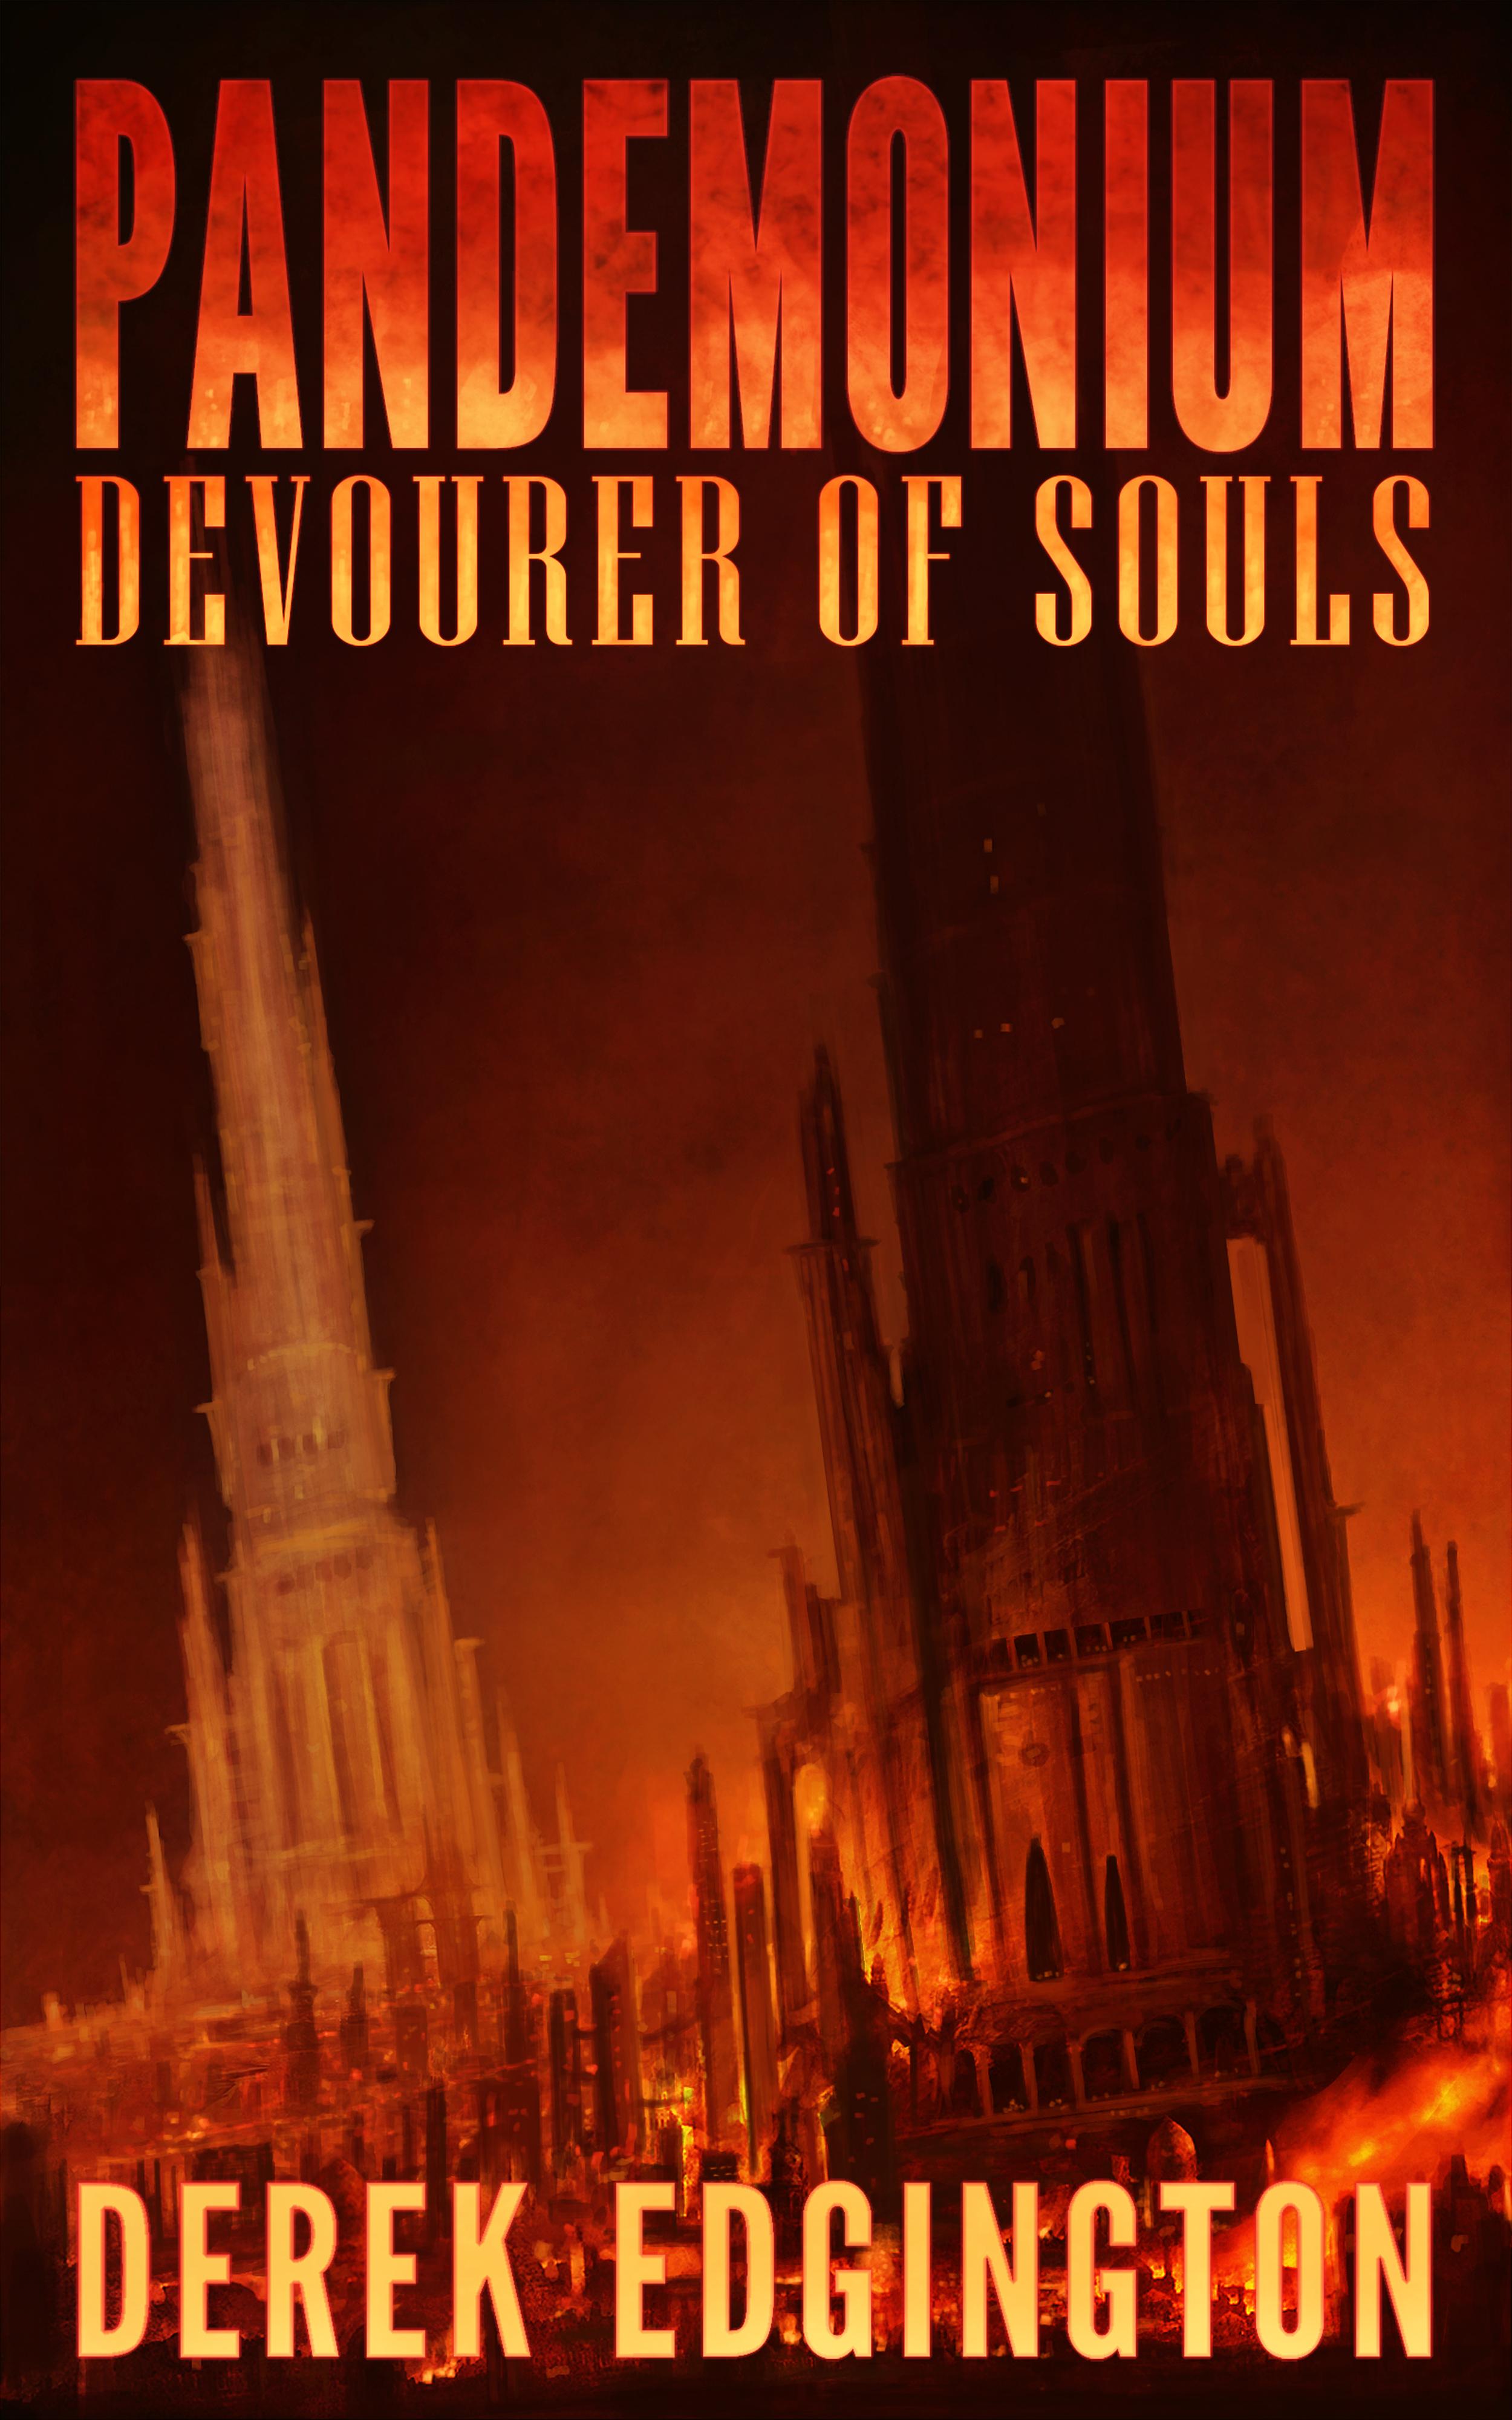 Pandemonium: Devourer of Souls Derek Edgington